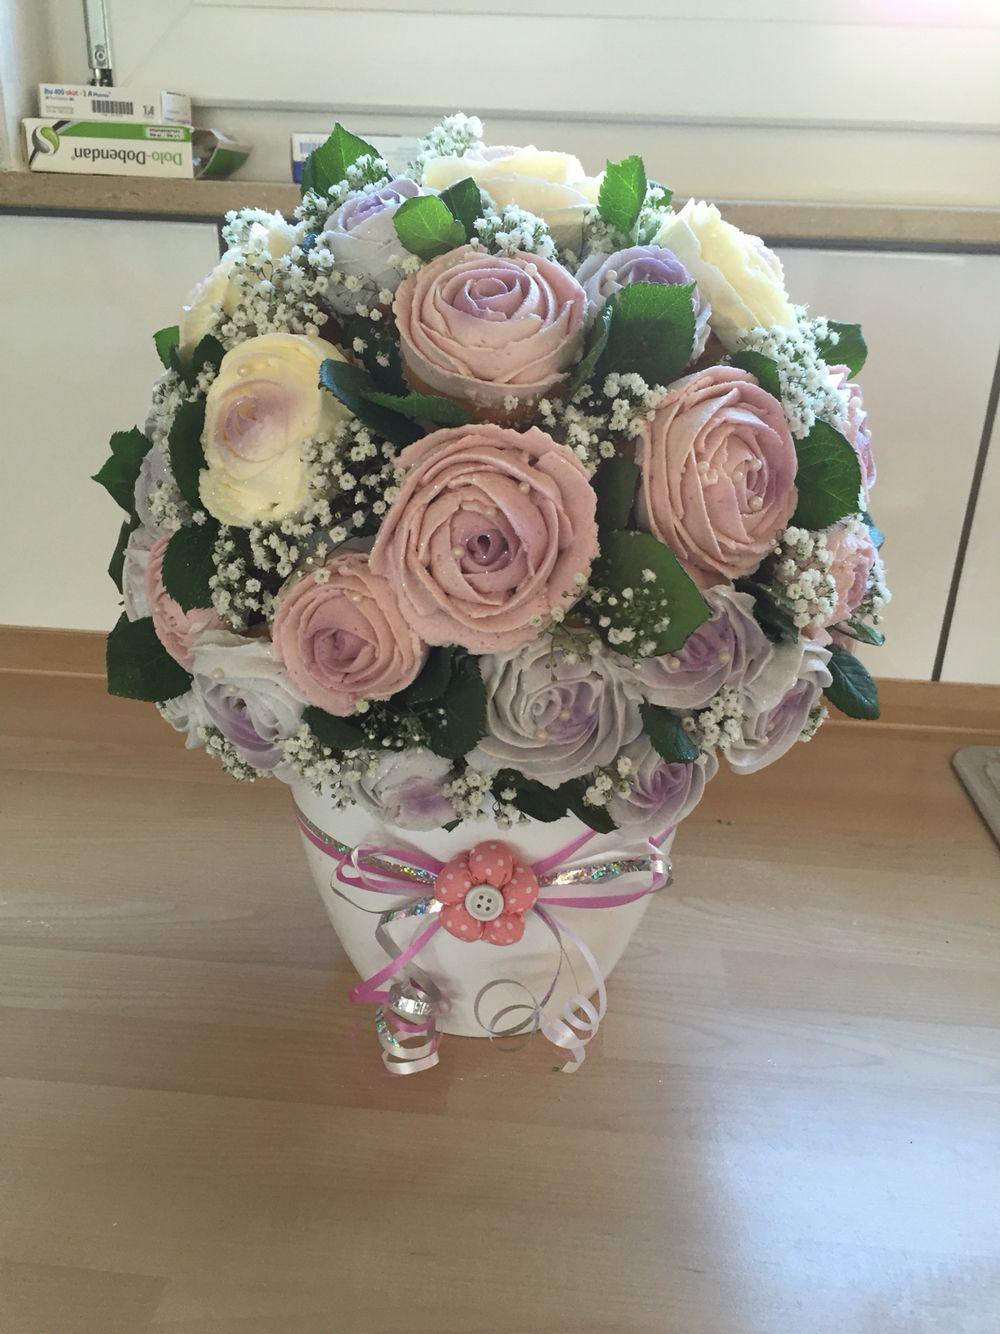 Cupcake bouquet arts crafts pinterest cupcake flower bouquets cupcake bouquet izmirmasajfo